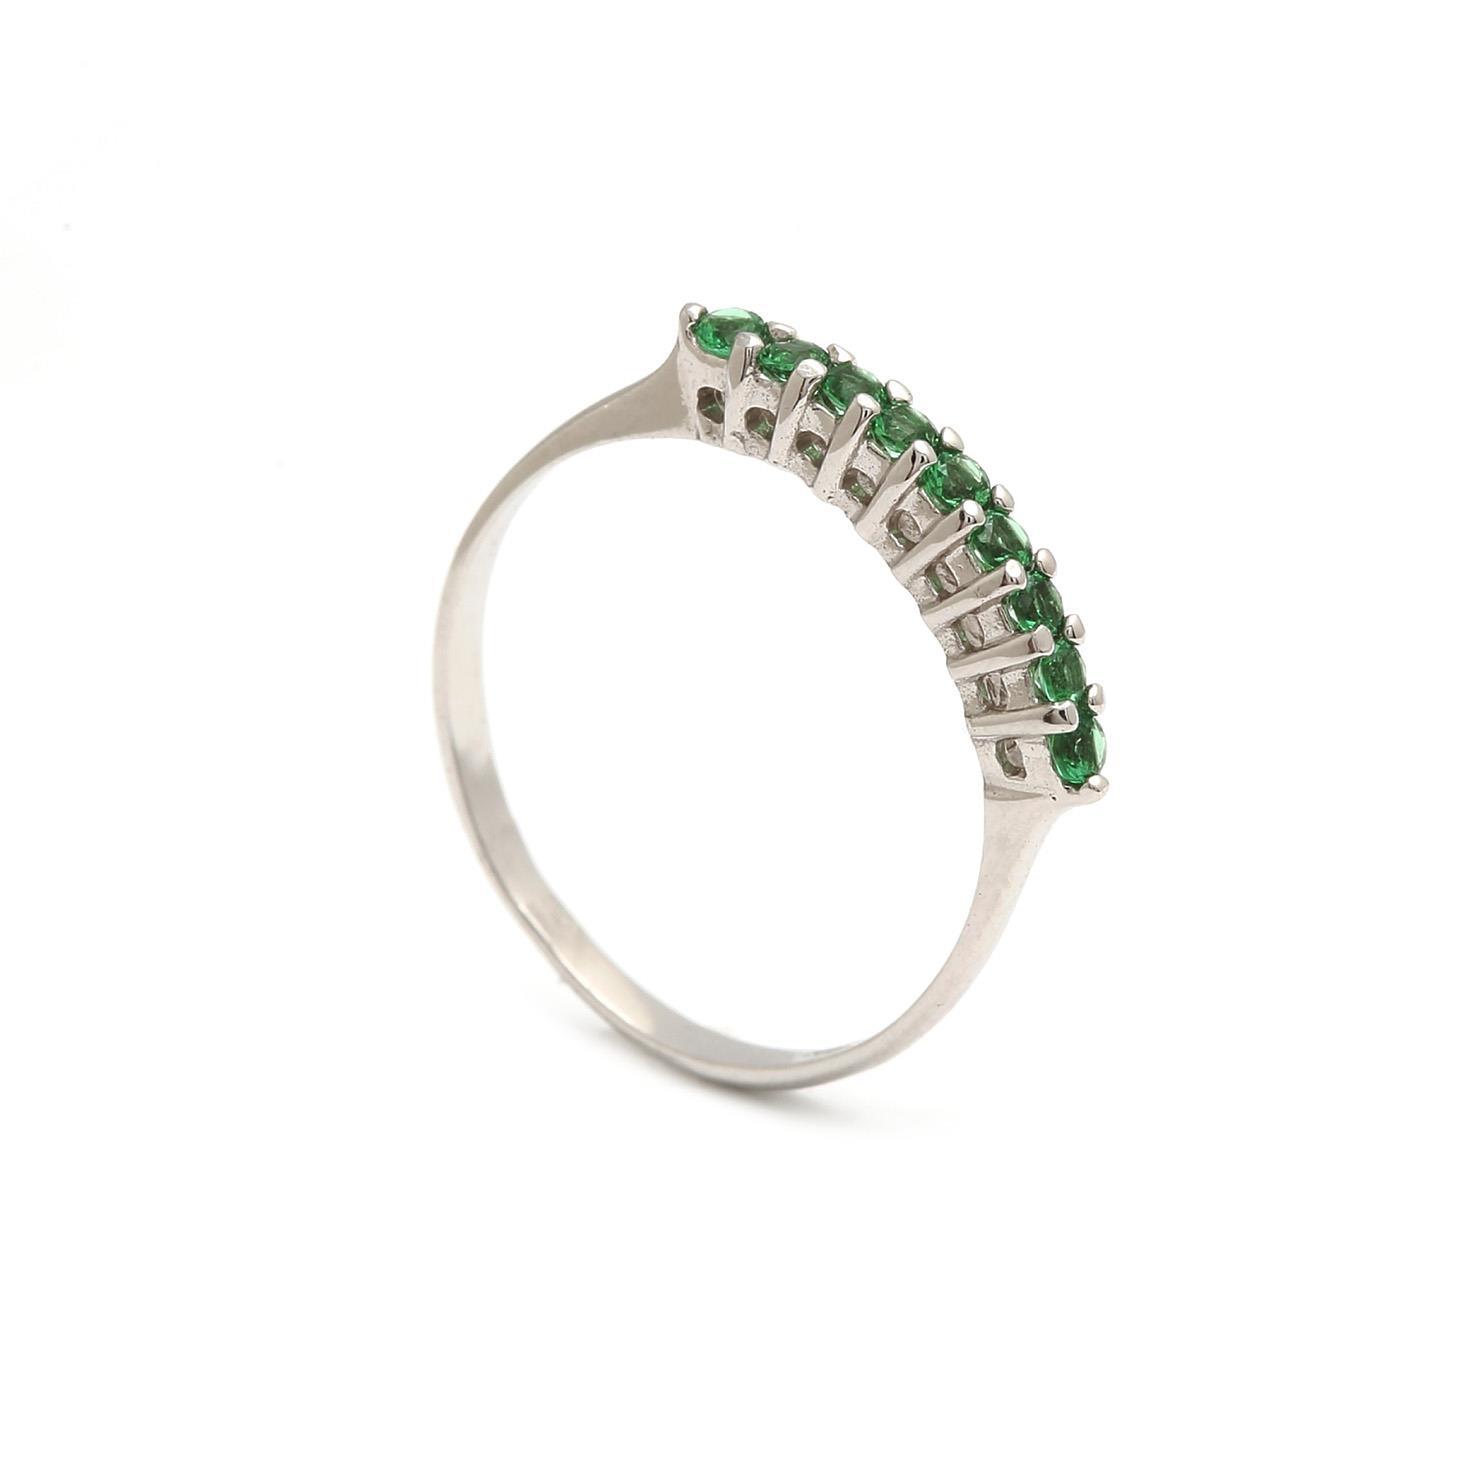 Zlatý dámsky prsteň SELVAGGIA green 1PB00165